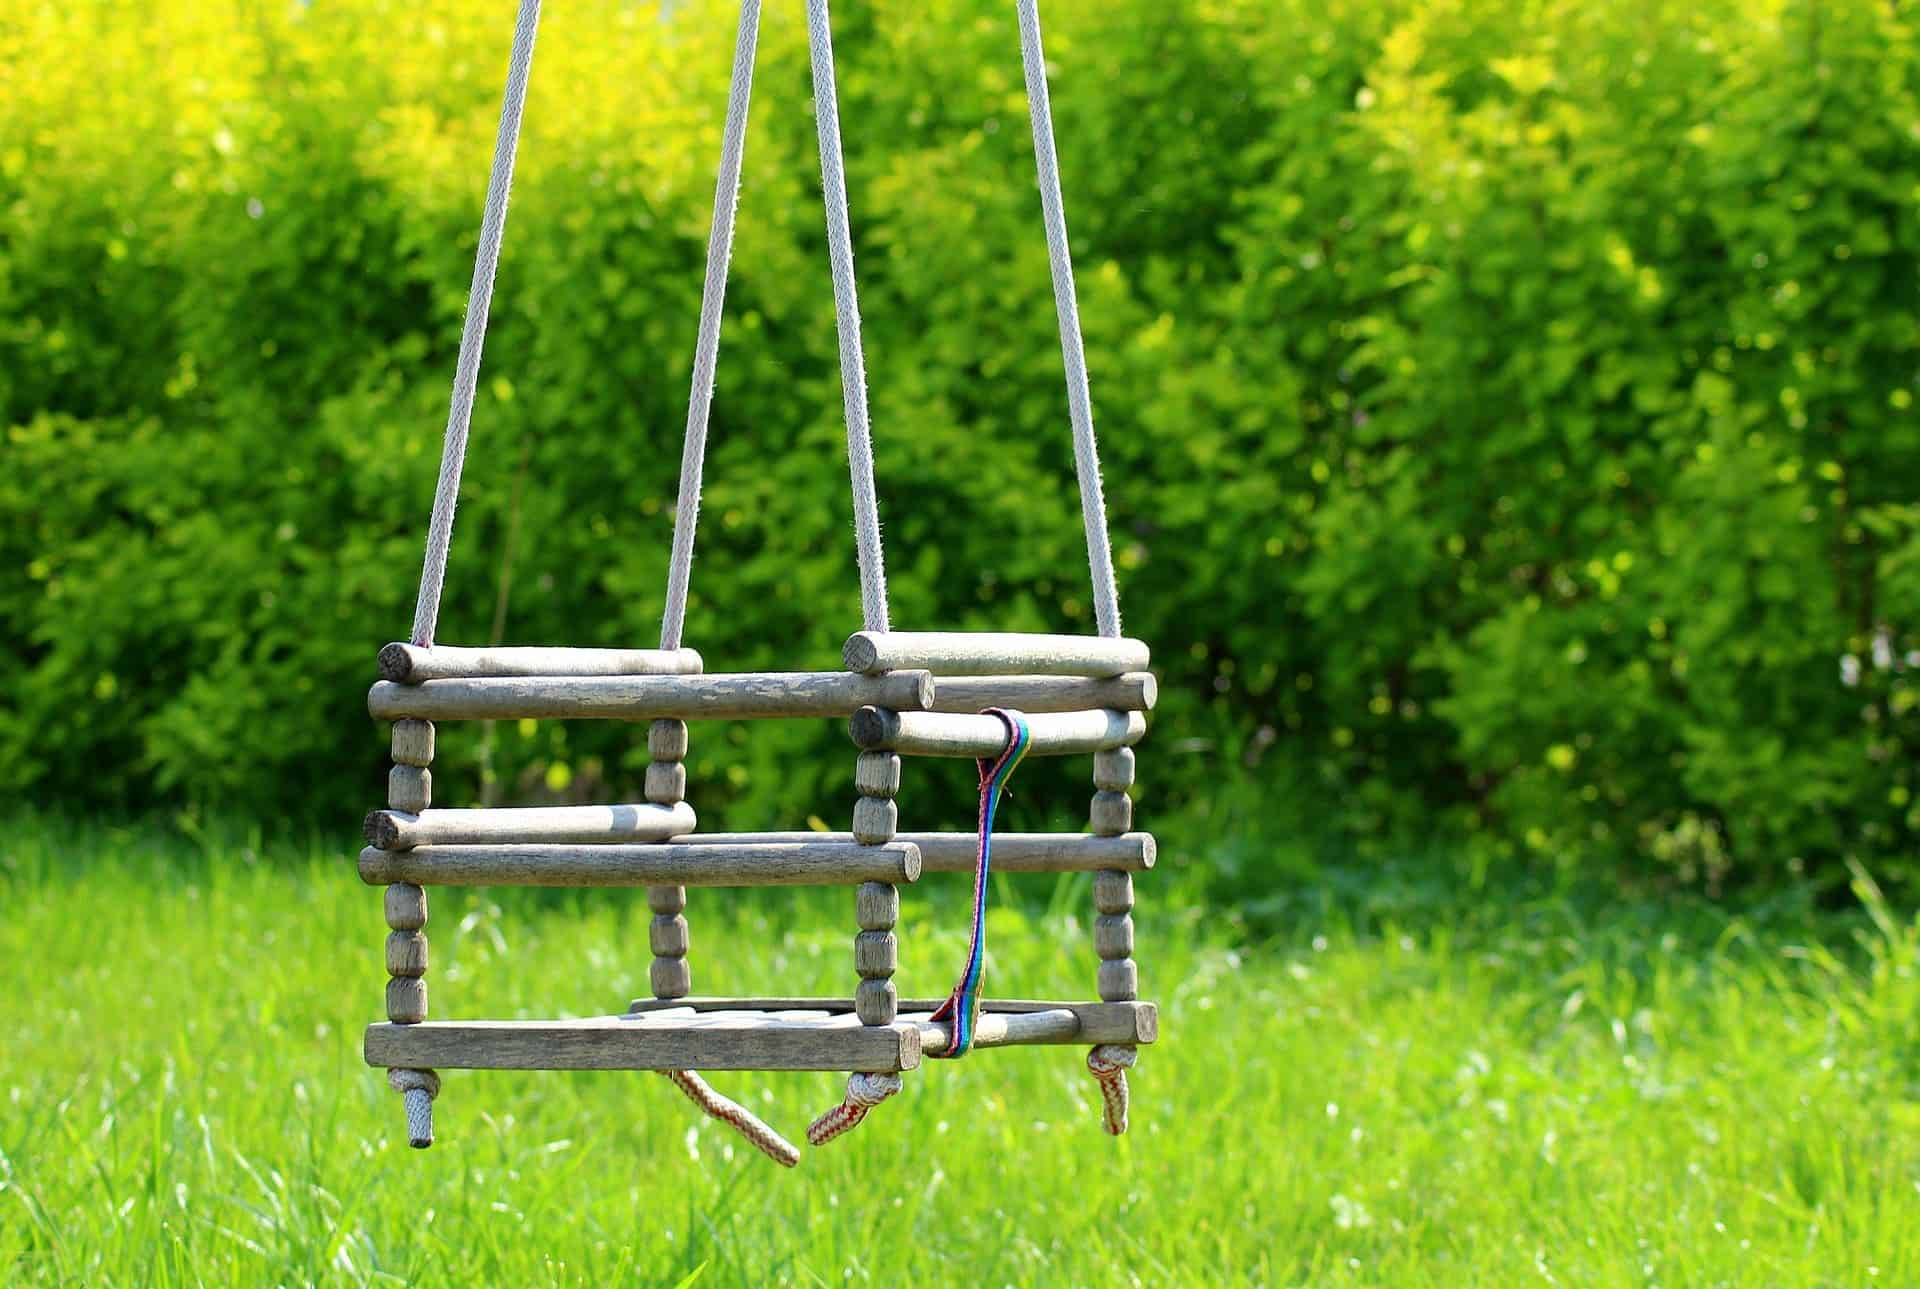 Full Size of Schaukel Metall Erwachsene Schaukelstuhl Garten Für Regal Bett Weiß Regale Kinderschaukel Wohnzimmer Schaukel Metall Erwachsene